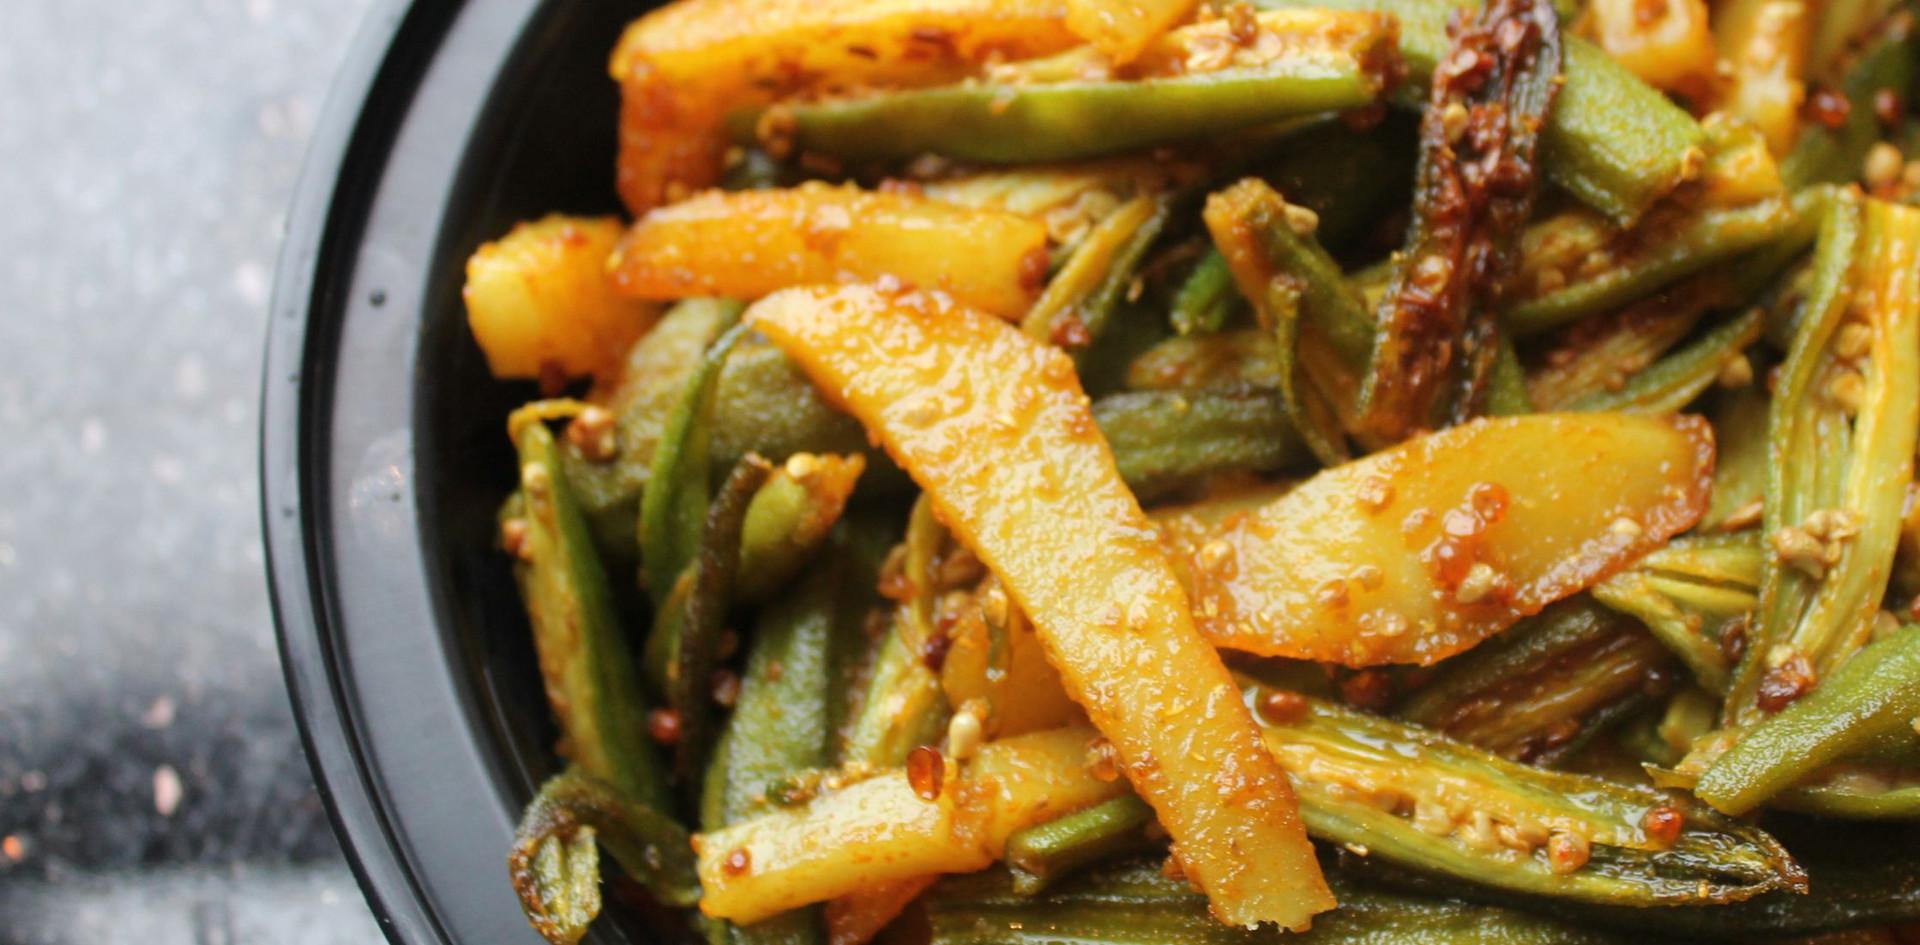 Okra and potato stir fry